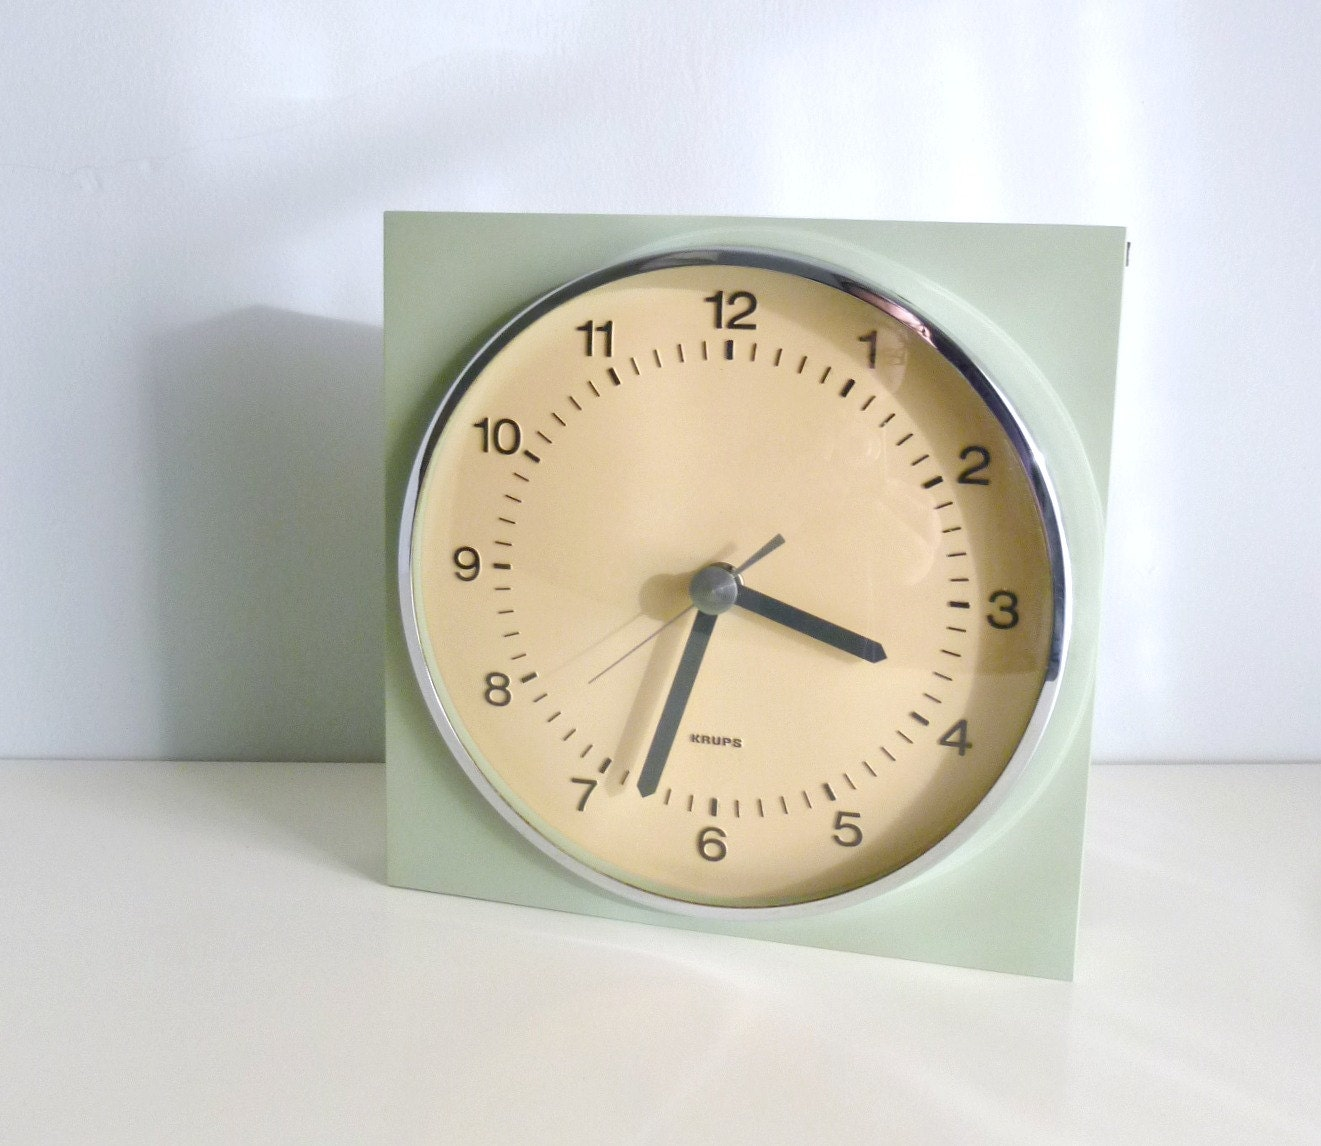 Mid Century Modern Wall Clock - Mint Green, Sage, Aqua - Minimalist - KRUPS Germany - Mad Men, 1960's, Eames Panton Era, Spring - mungoandmidge